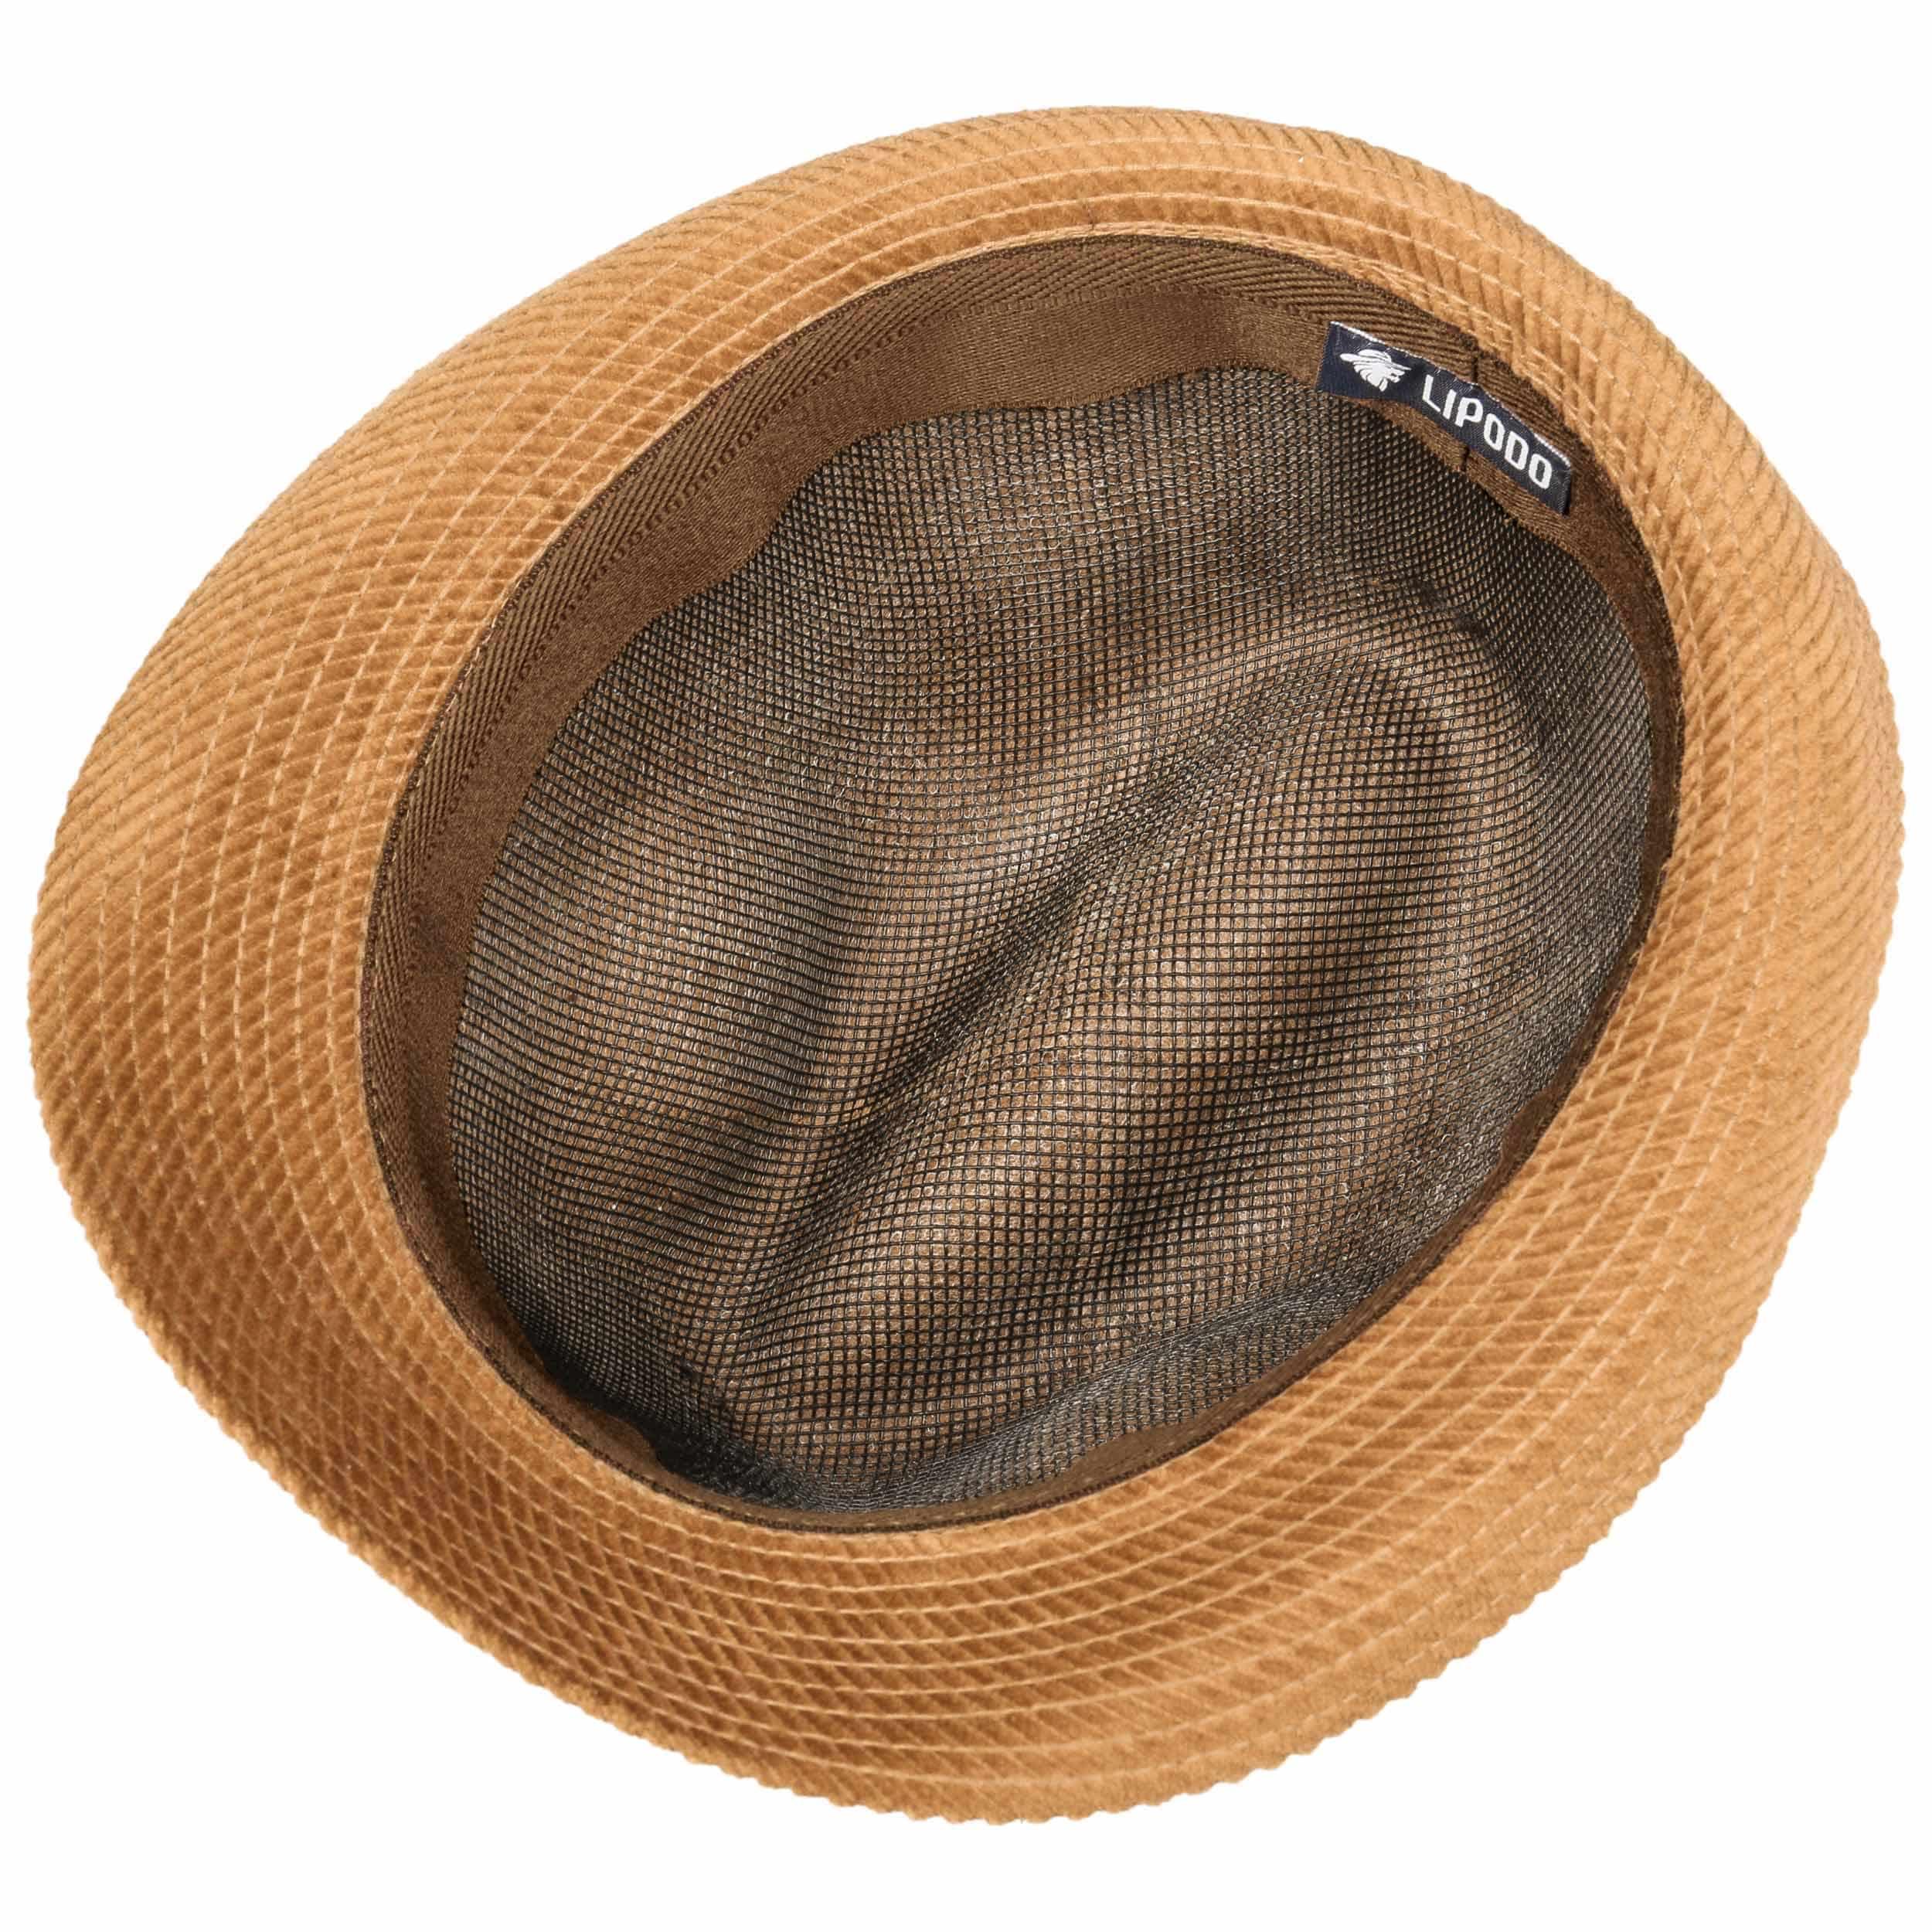 763f04803d0 ... Molinar Corduroy Hat by Lipodo - brown 3 ...